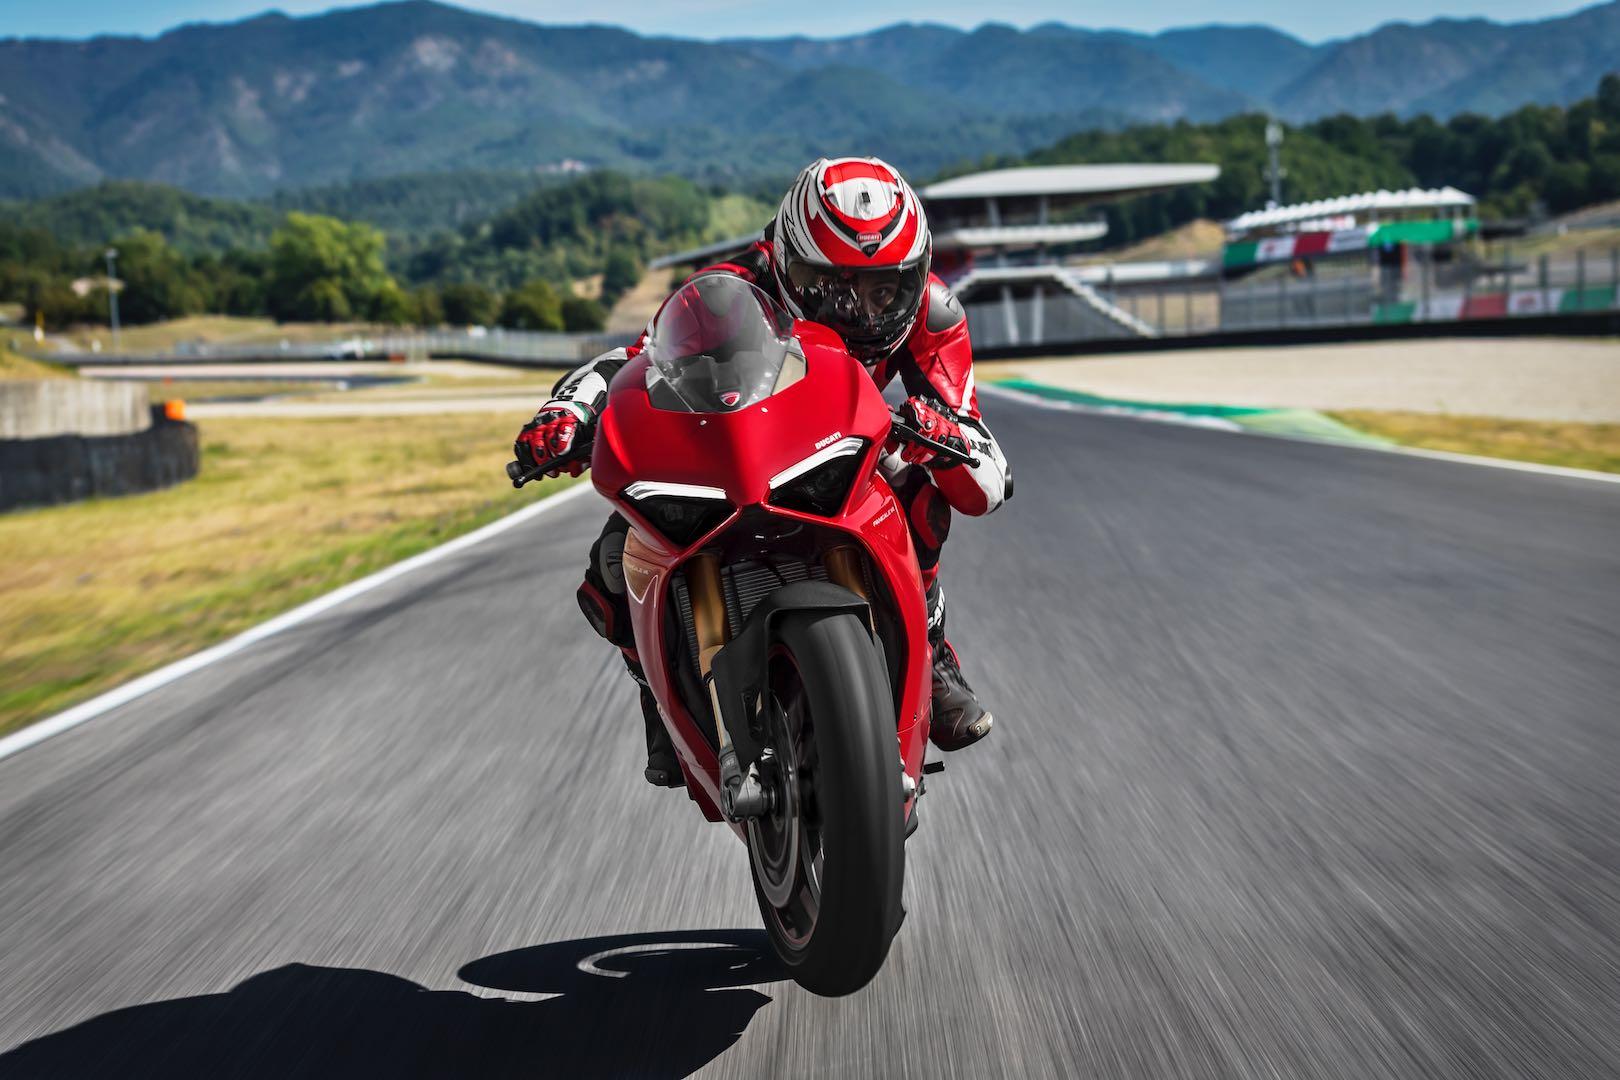 2018 Ducati Panigale V4 wheelie